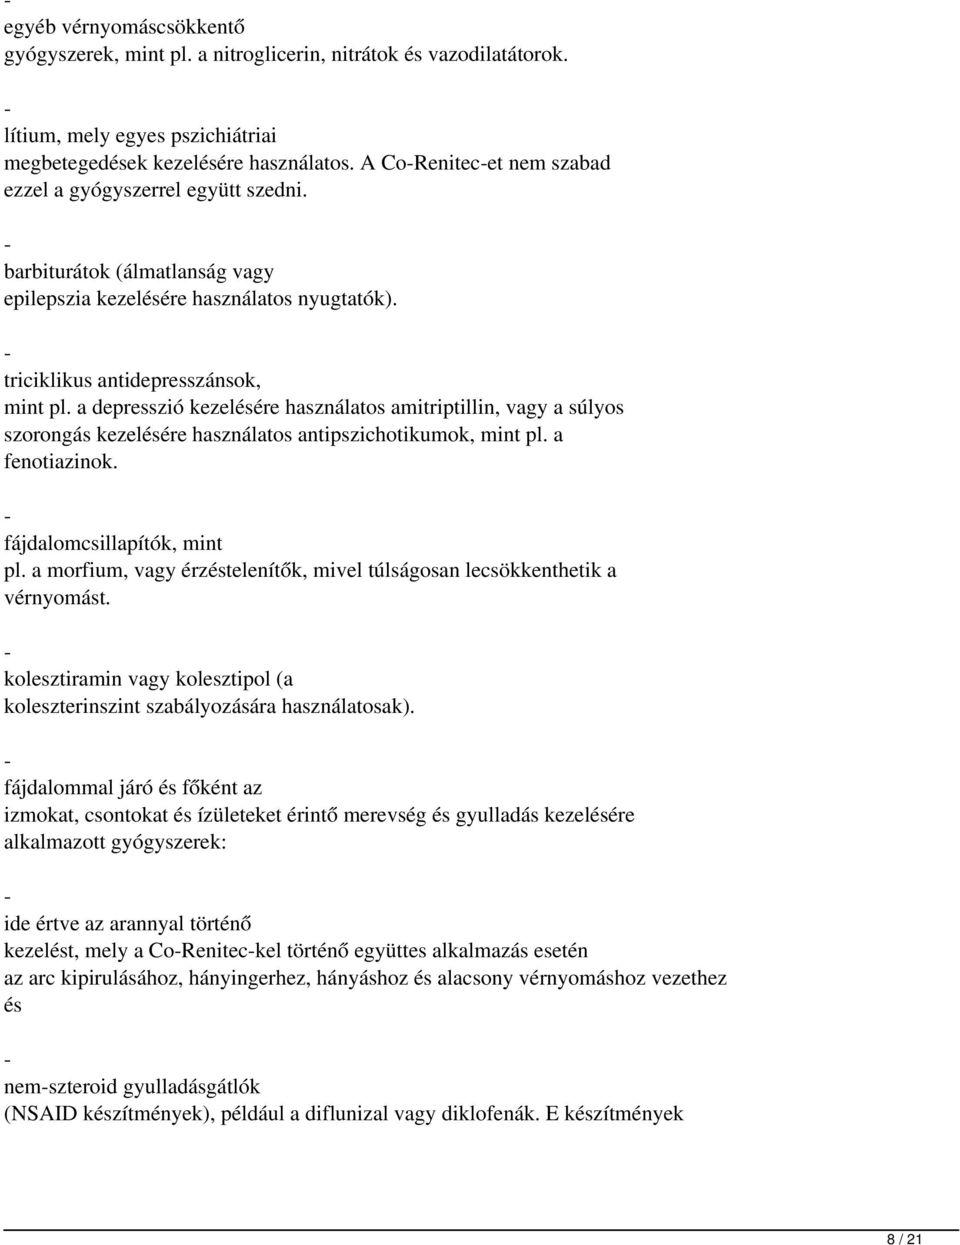 NITROLINGUAL AEROSZOL 14,2 G